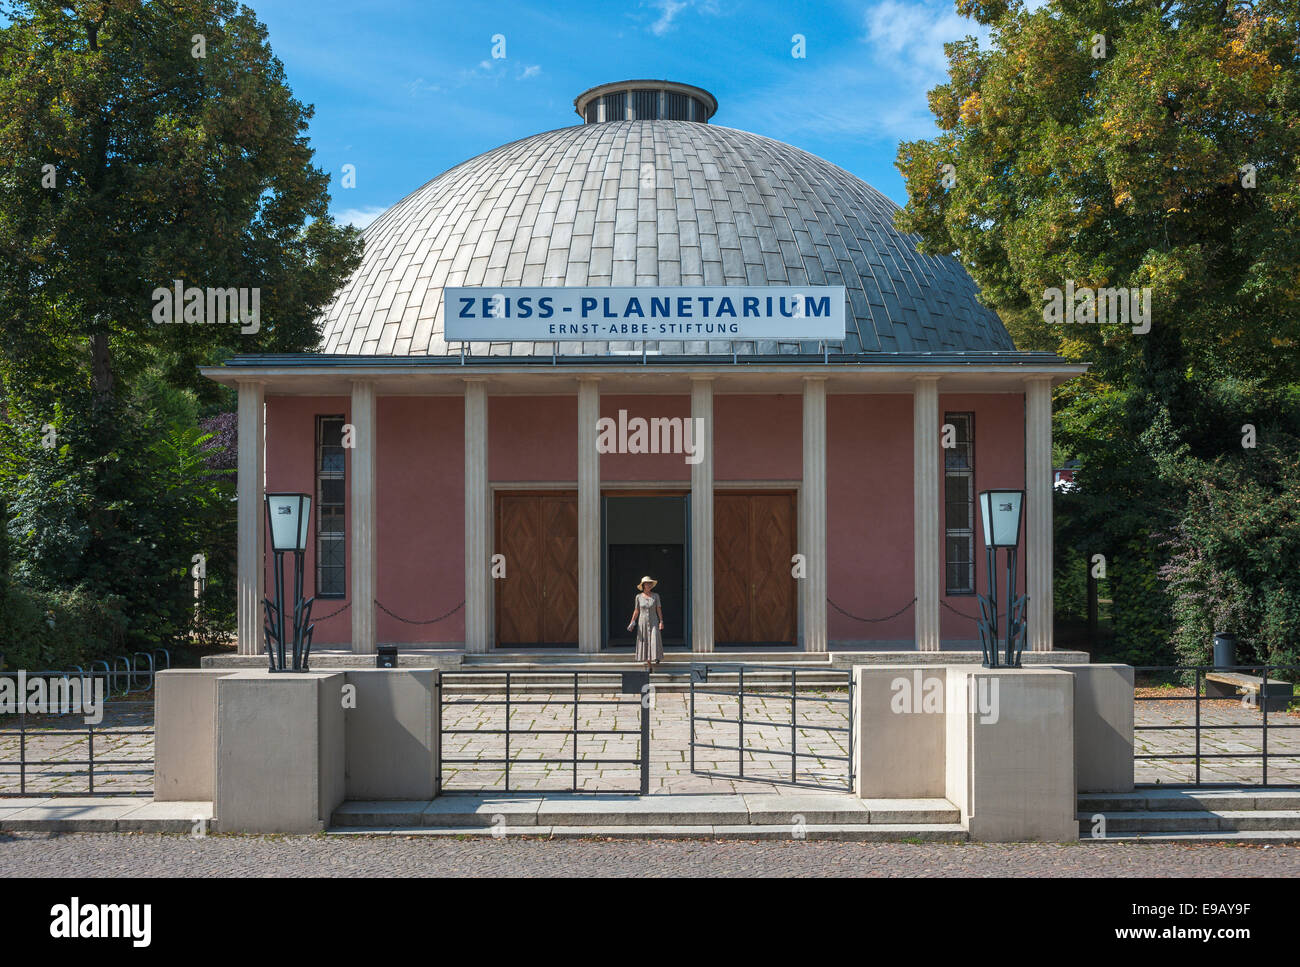 Zeiss Planetarium, Jena, Thuringia, Germany - Stock Image